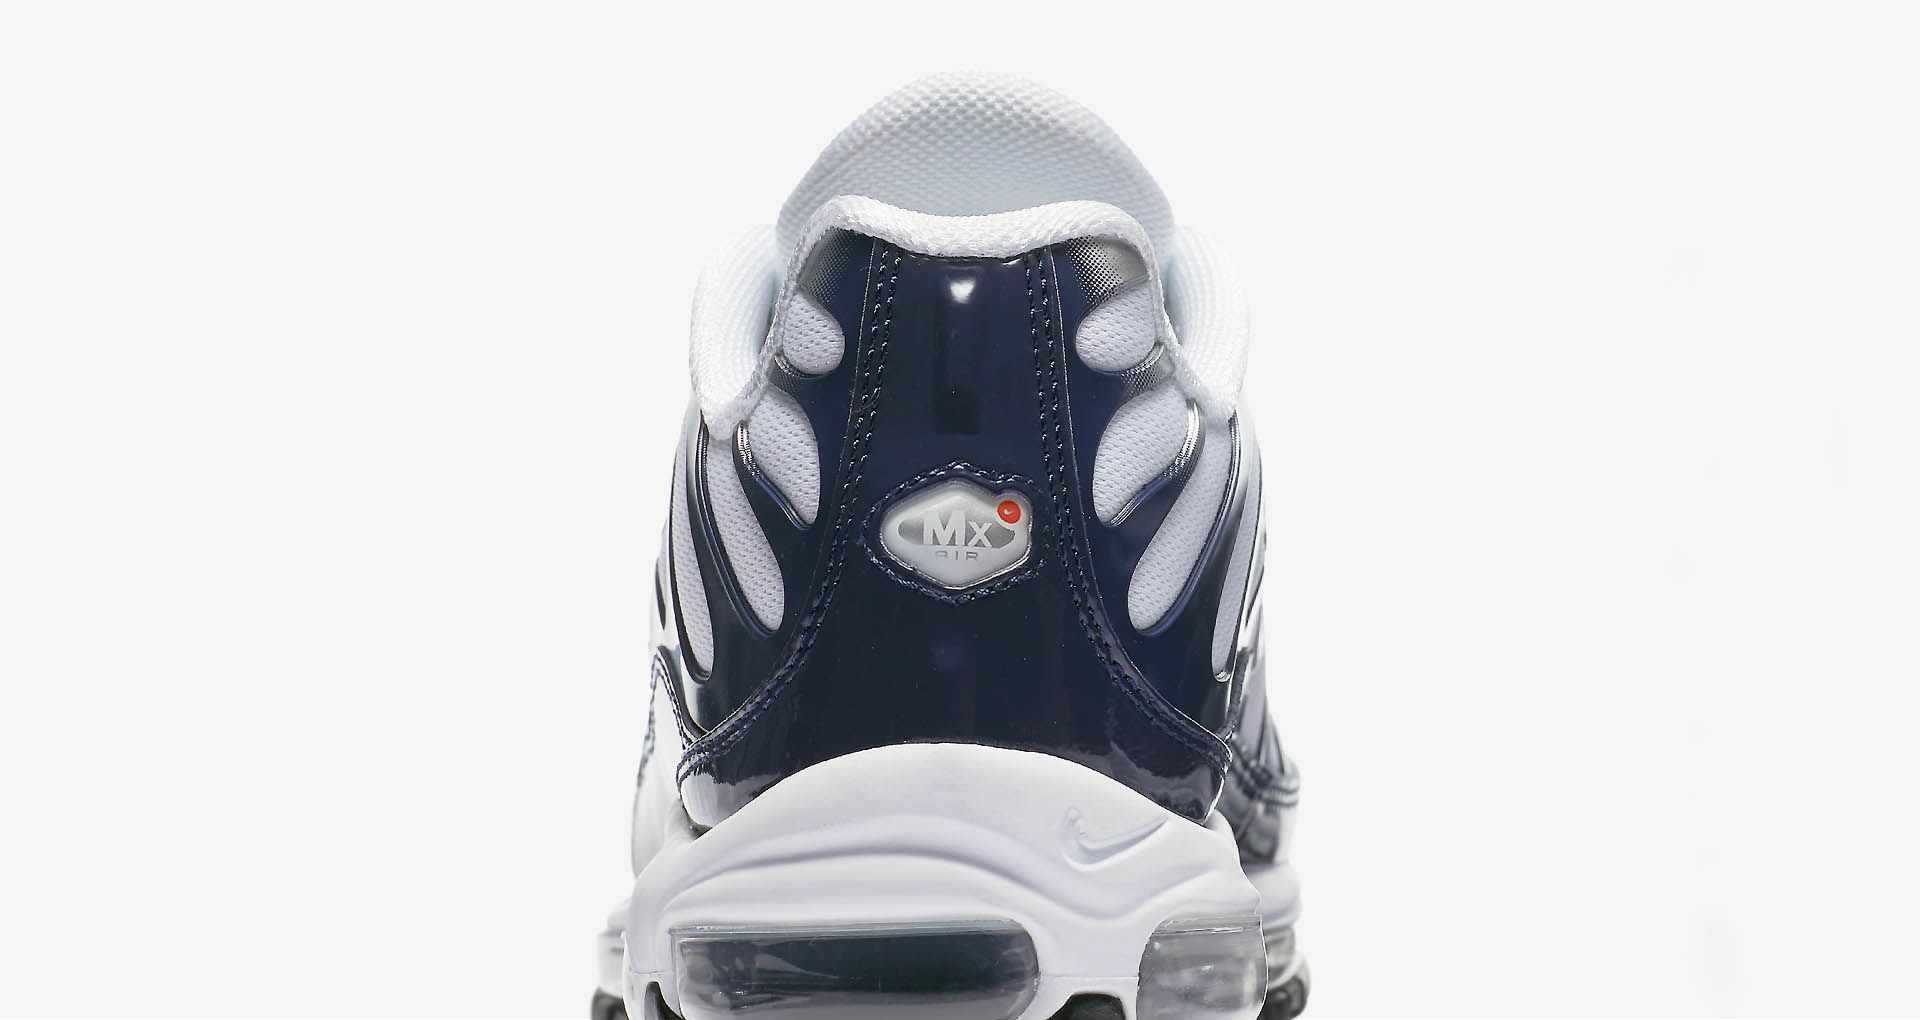 Nike Air Max 97 Plus 'Metallic Silver & Midnight Navy